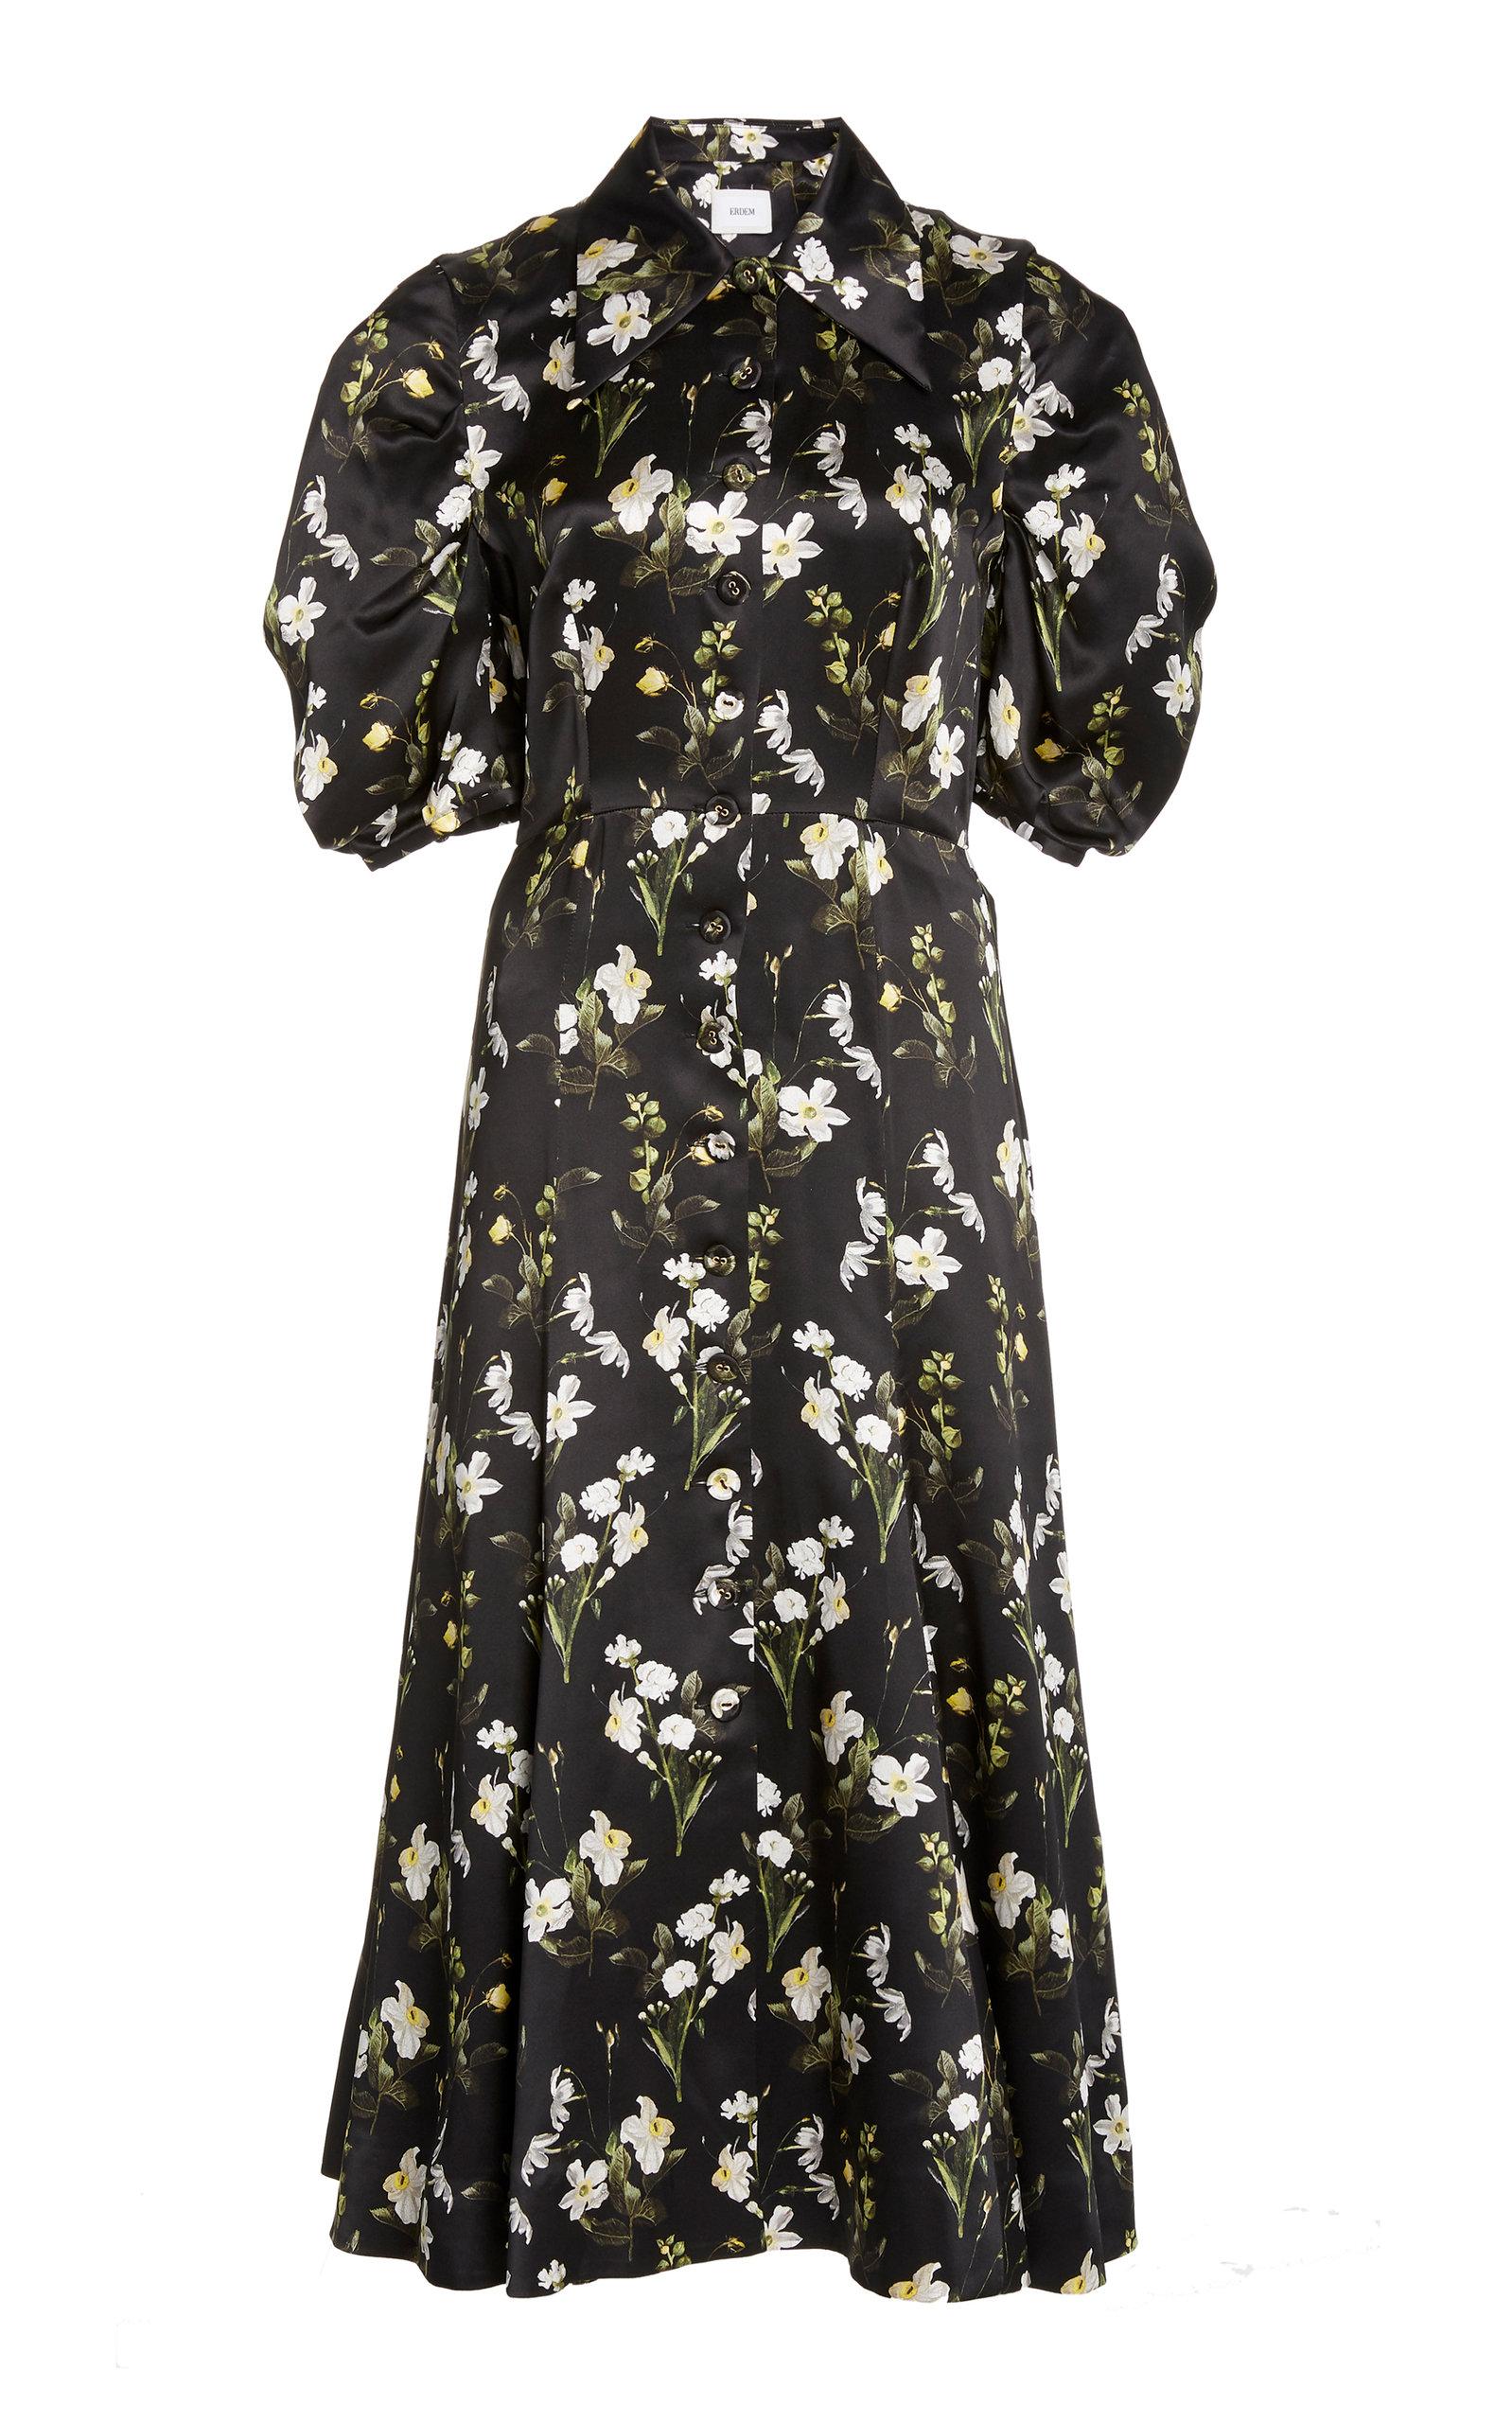 Buy Erdem Gisella Floral-Print Silk Dress online, shop Erdem at the best price